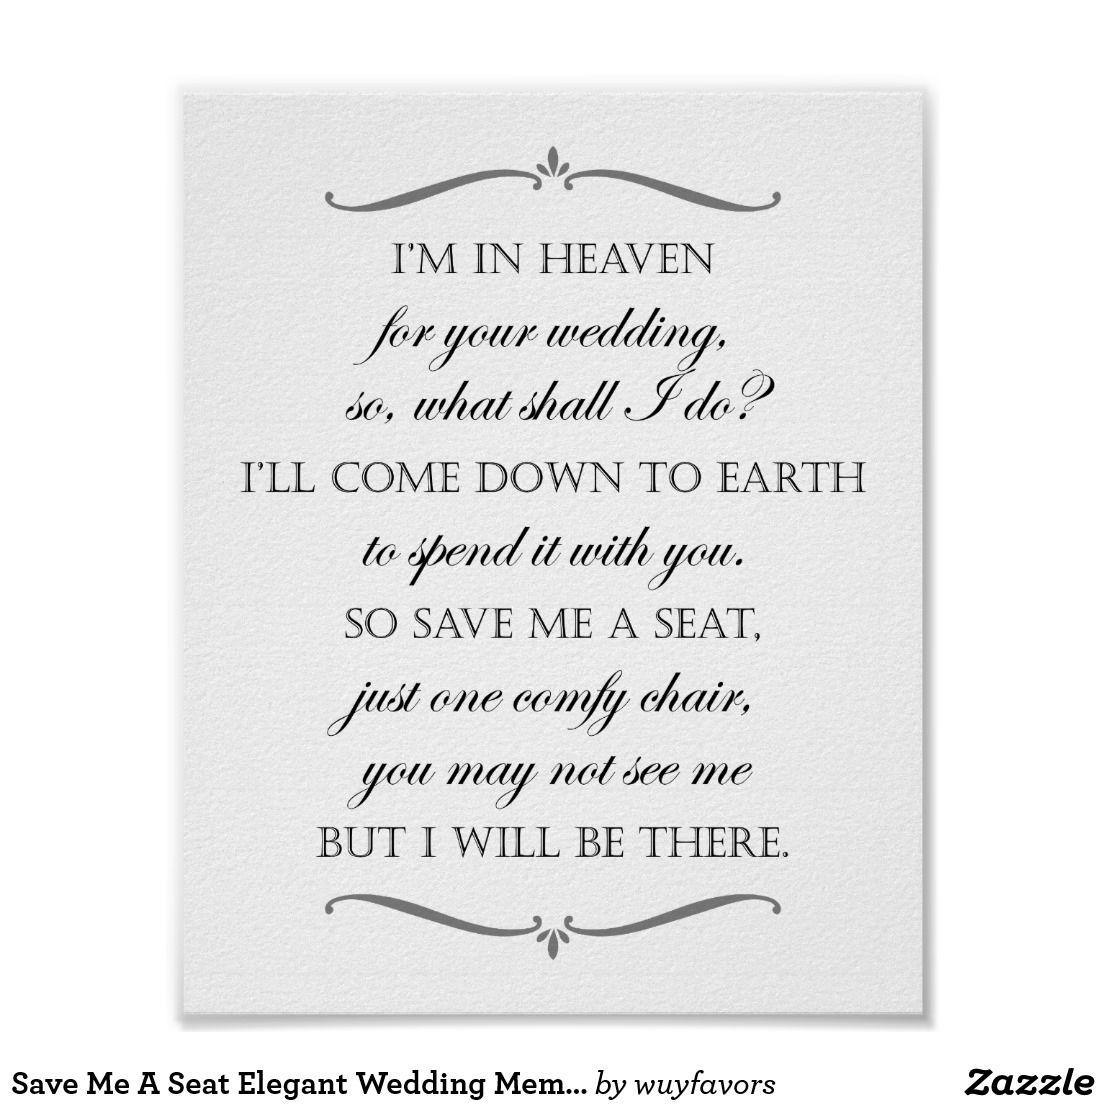 Save Me A Seat Elegant Wedding Memorial Chair Poster